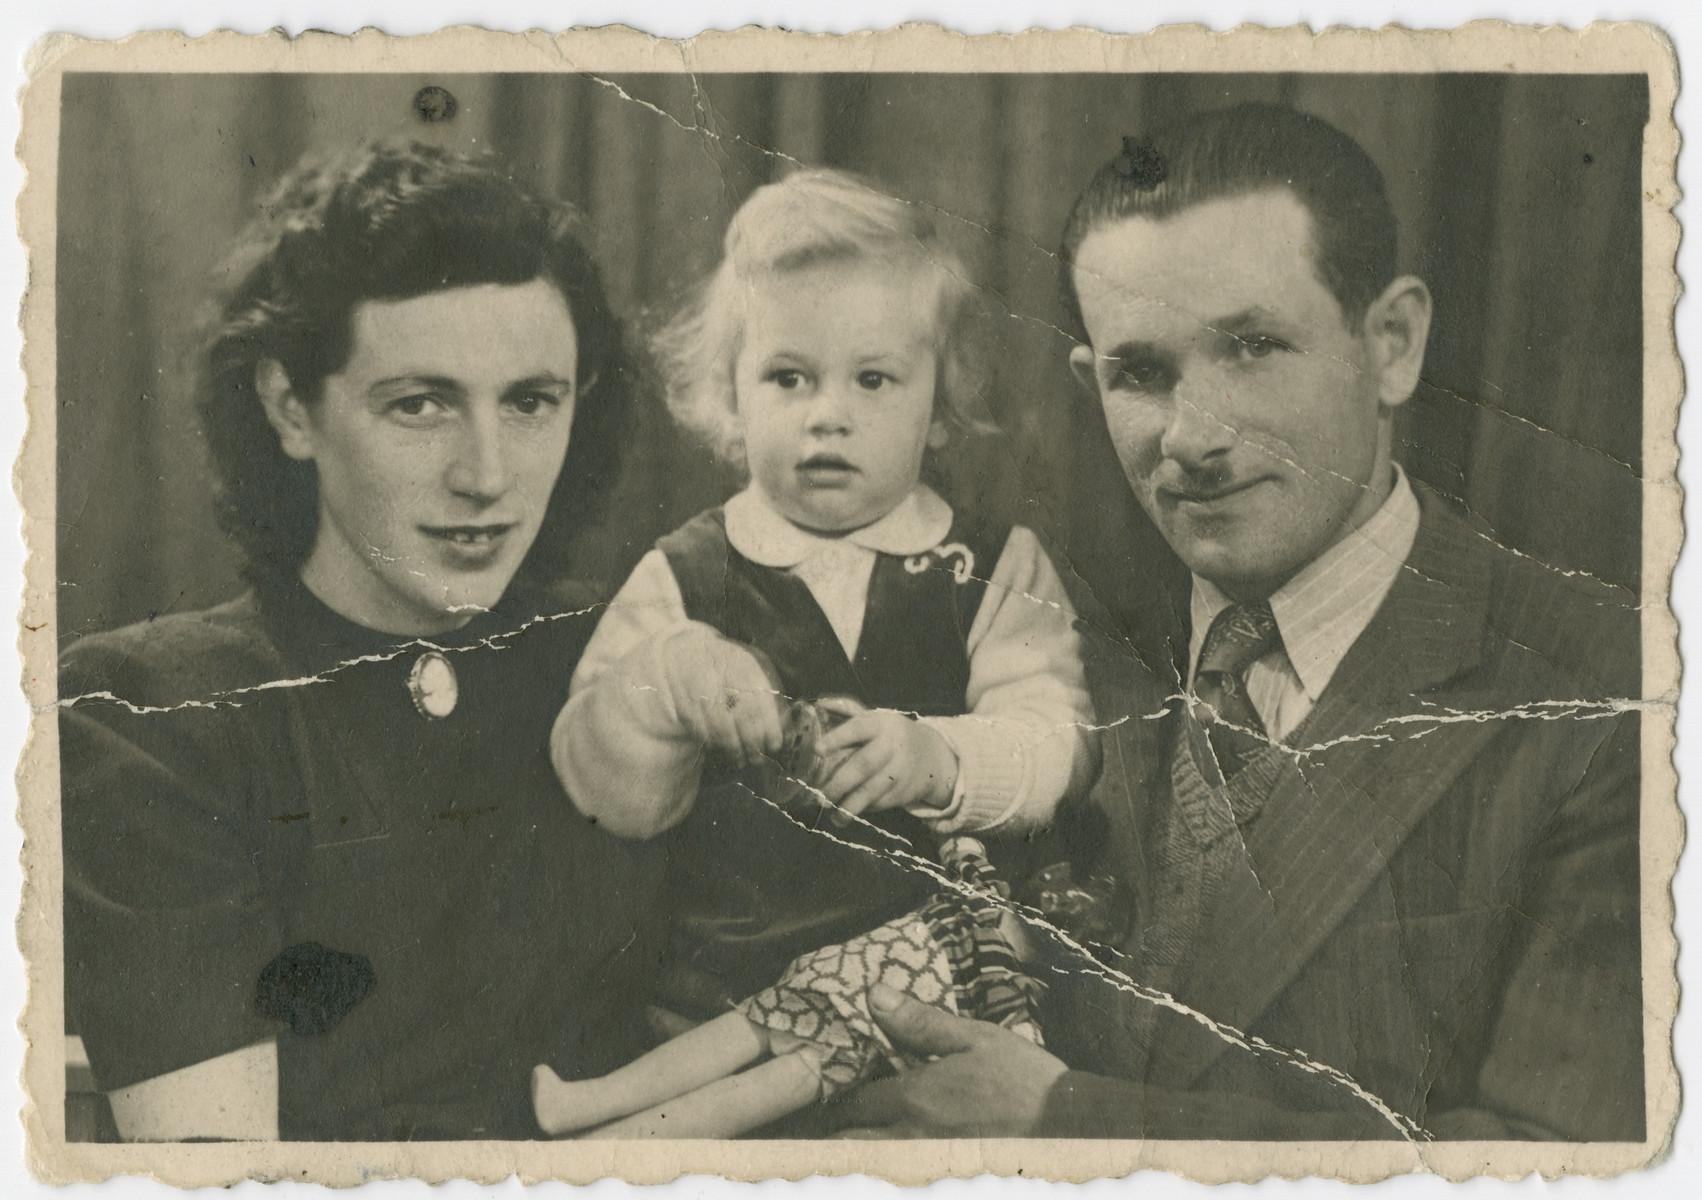 Studio portrait of Lola, Nili and Yehuda Bielski.